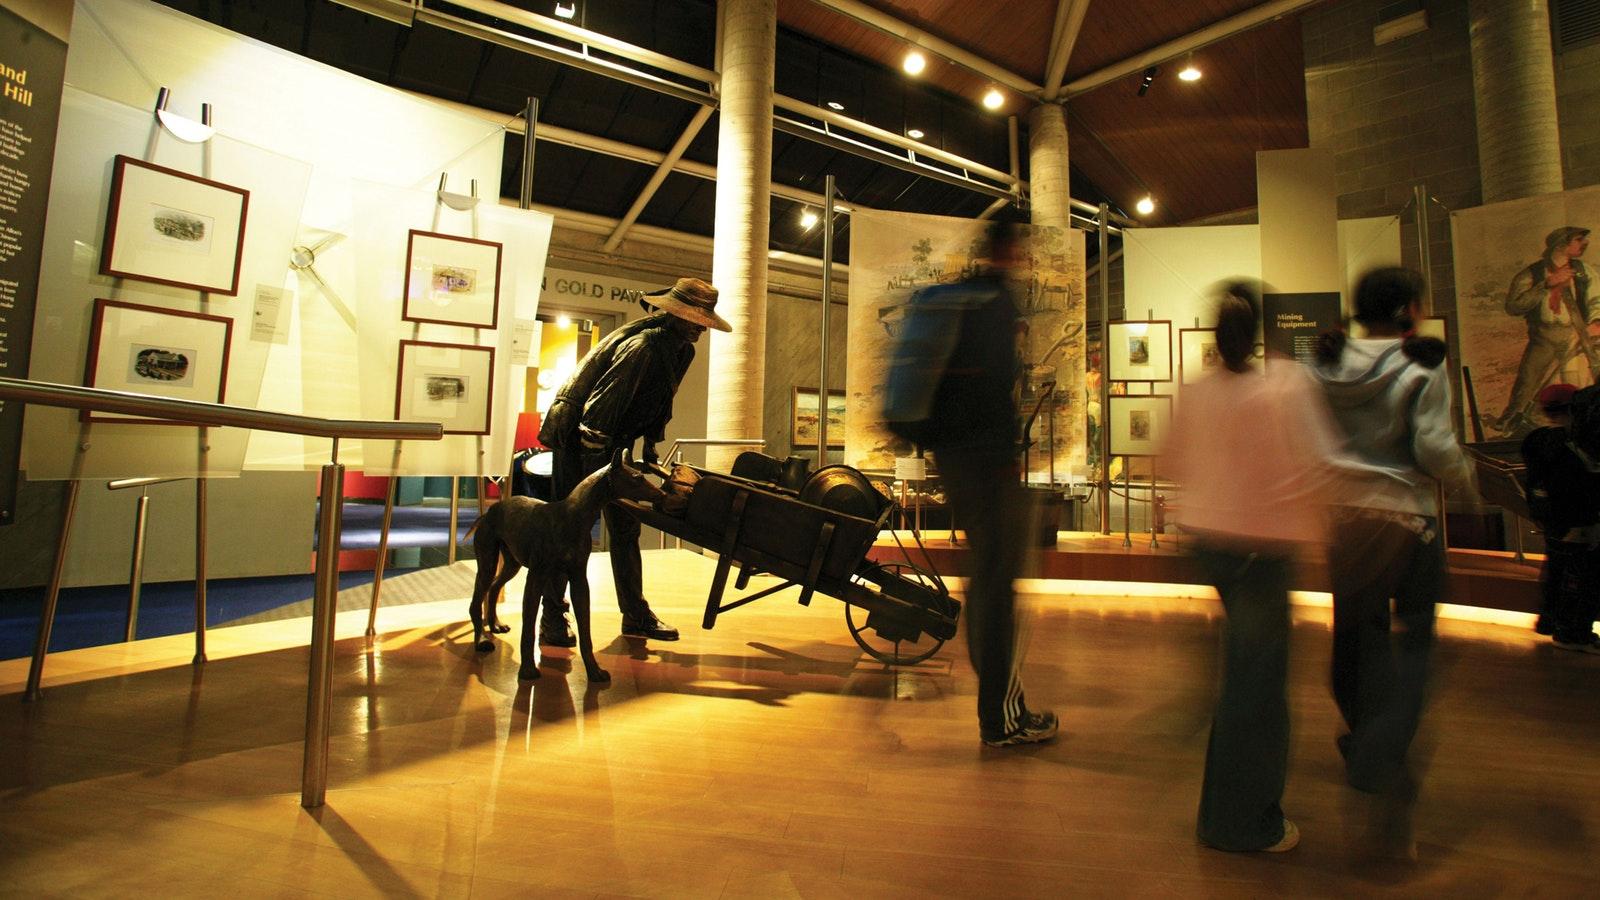 Gold Museum Exhibition